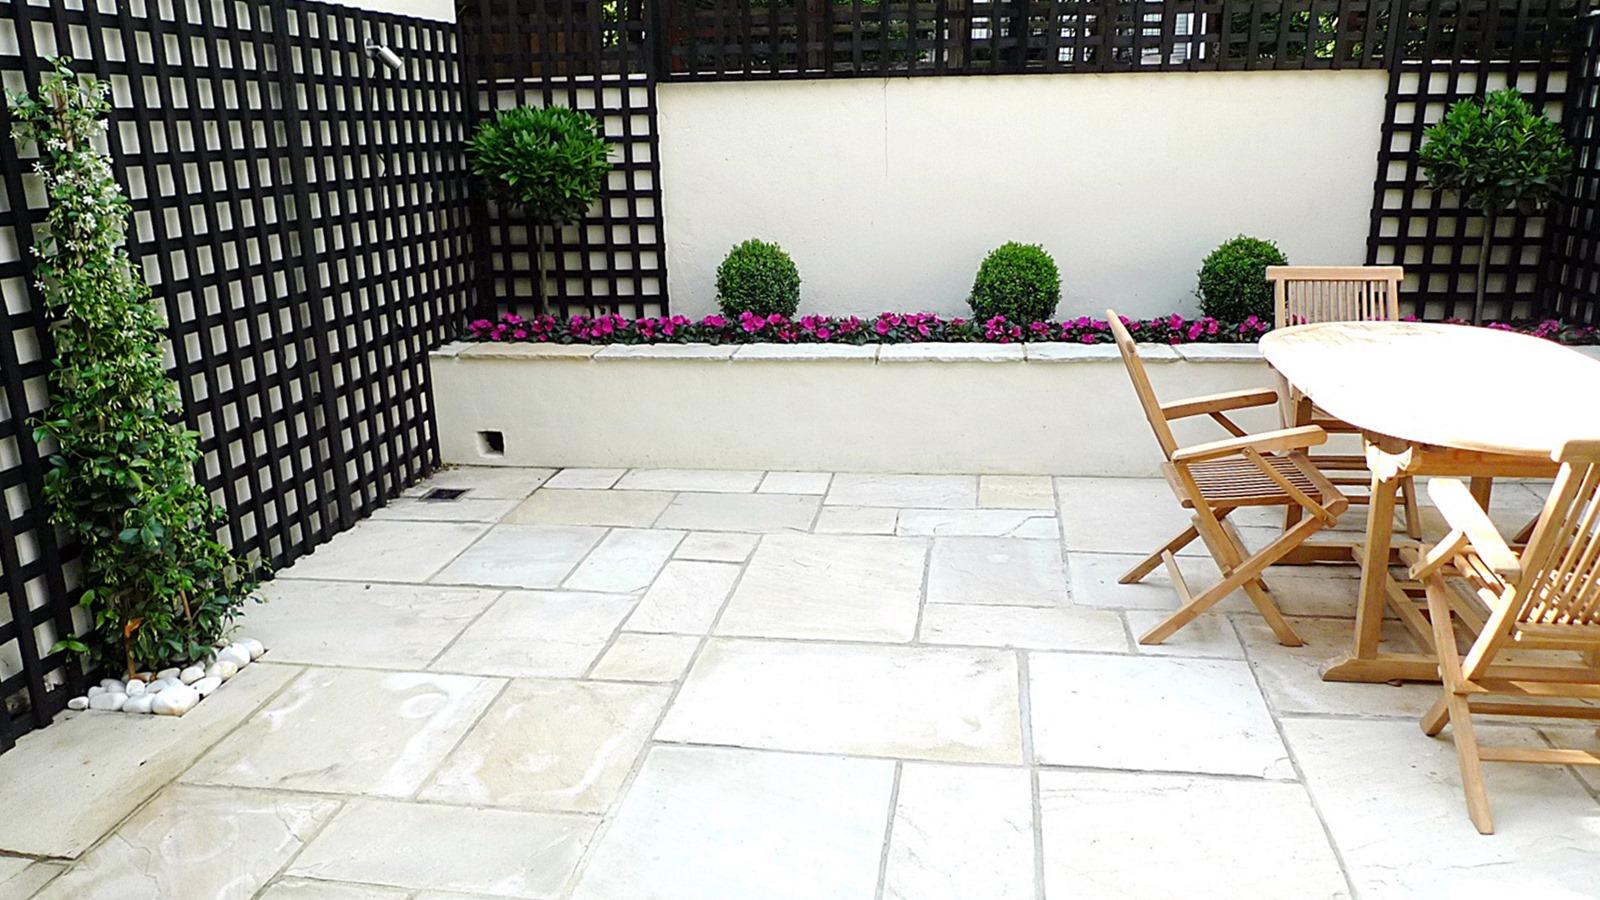 beds classic modern planting black trellis white walls clapham london 1600 x 900